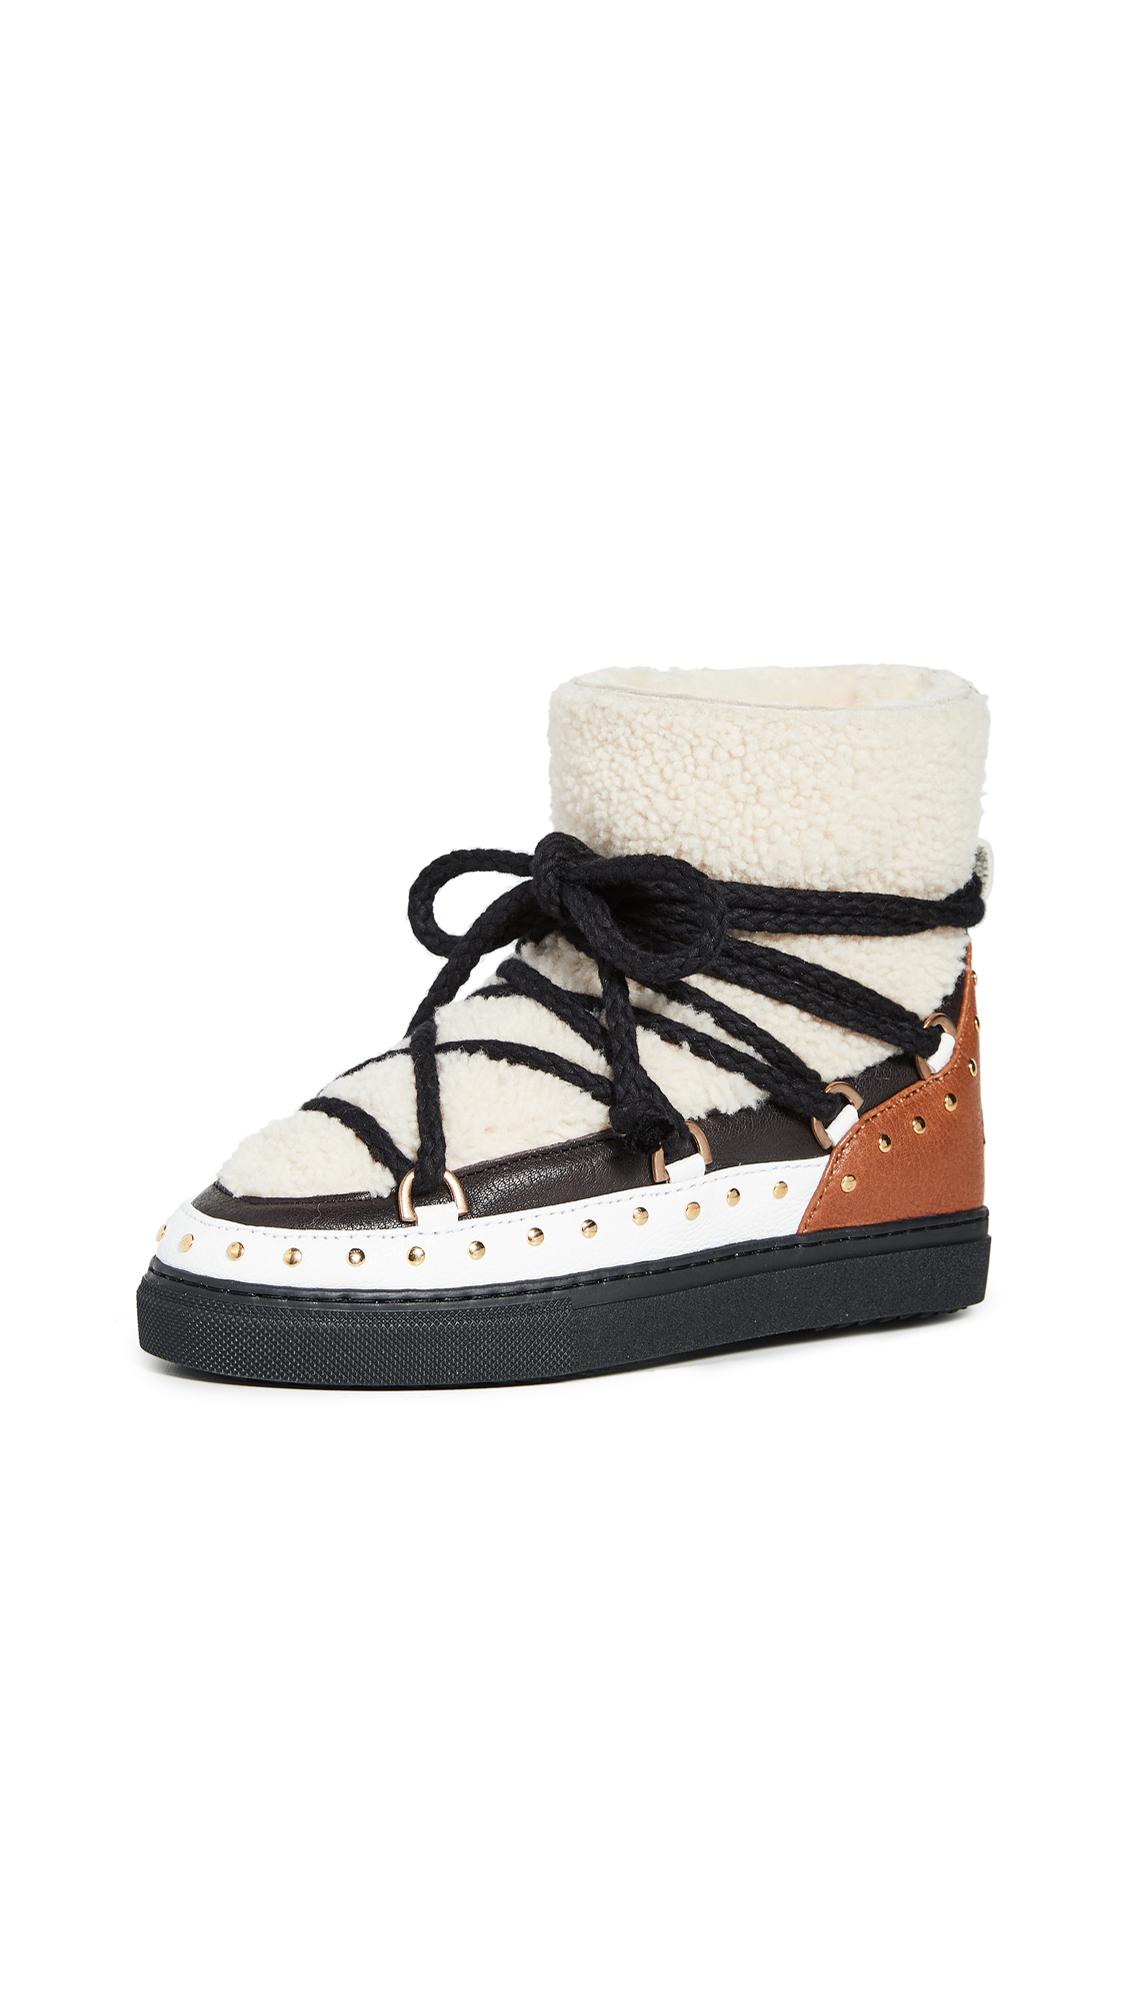 Buy Inuikii Curly Rock Shearling Sneakers online, shop Inuikii